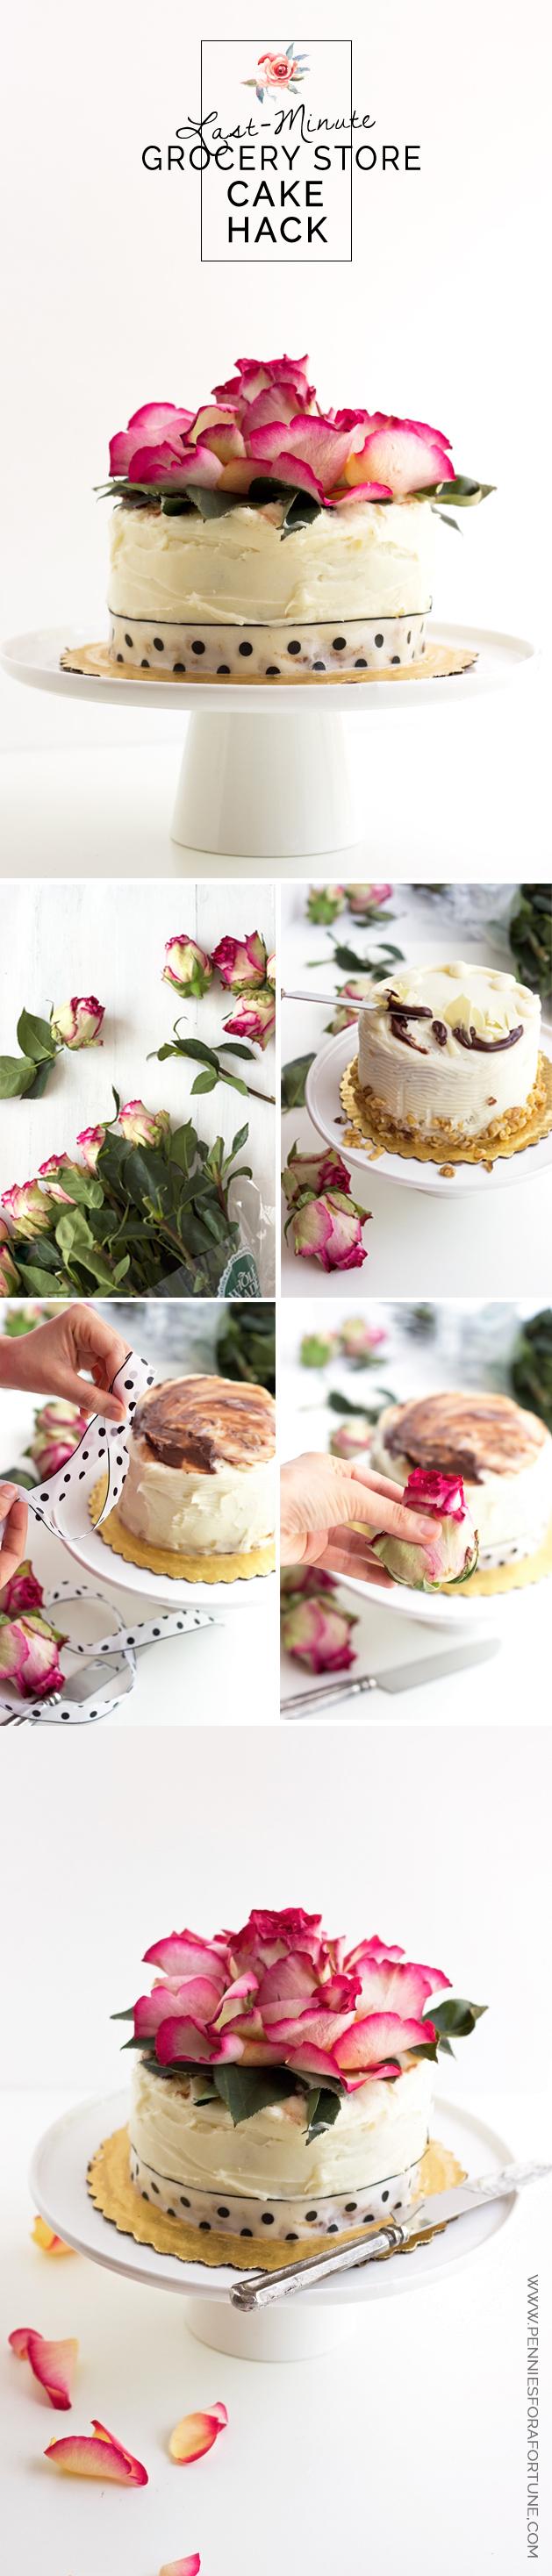 Sarnia Food Fresh Grocery Store Icing Cake